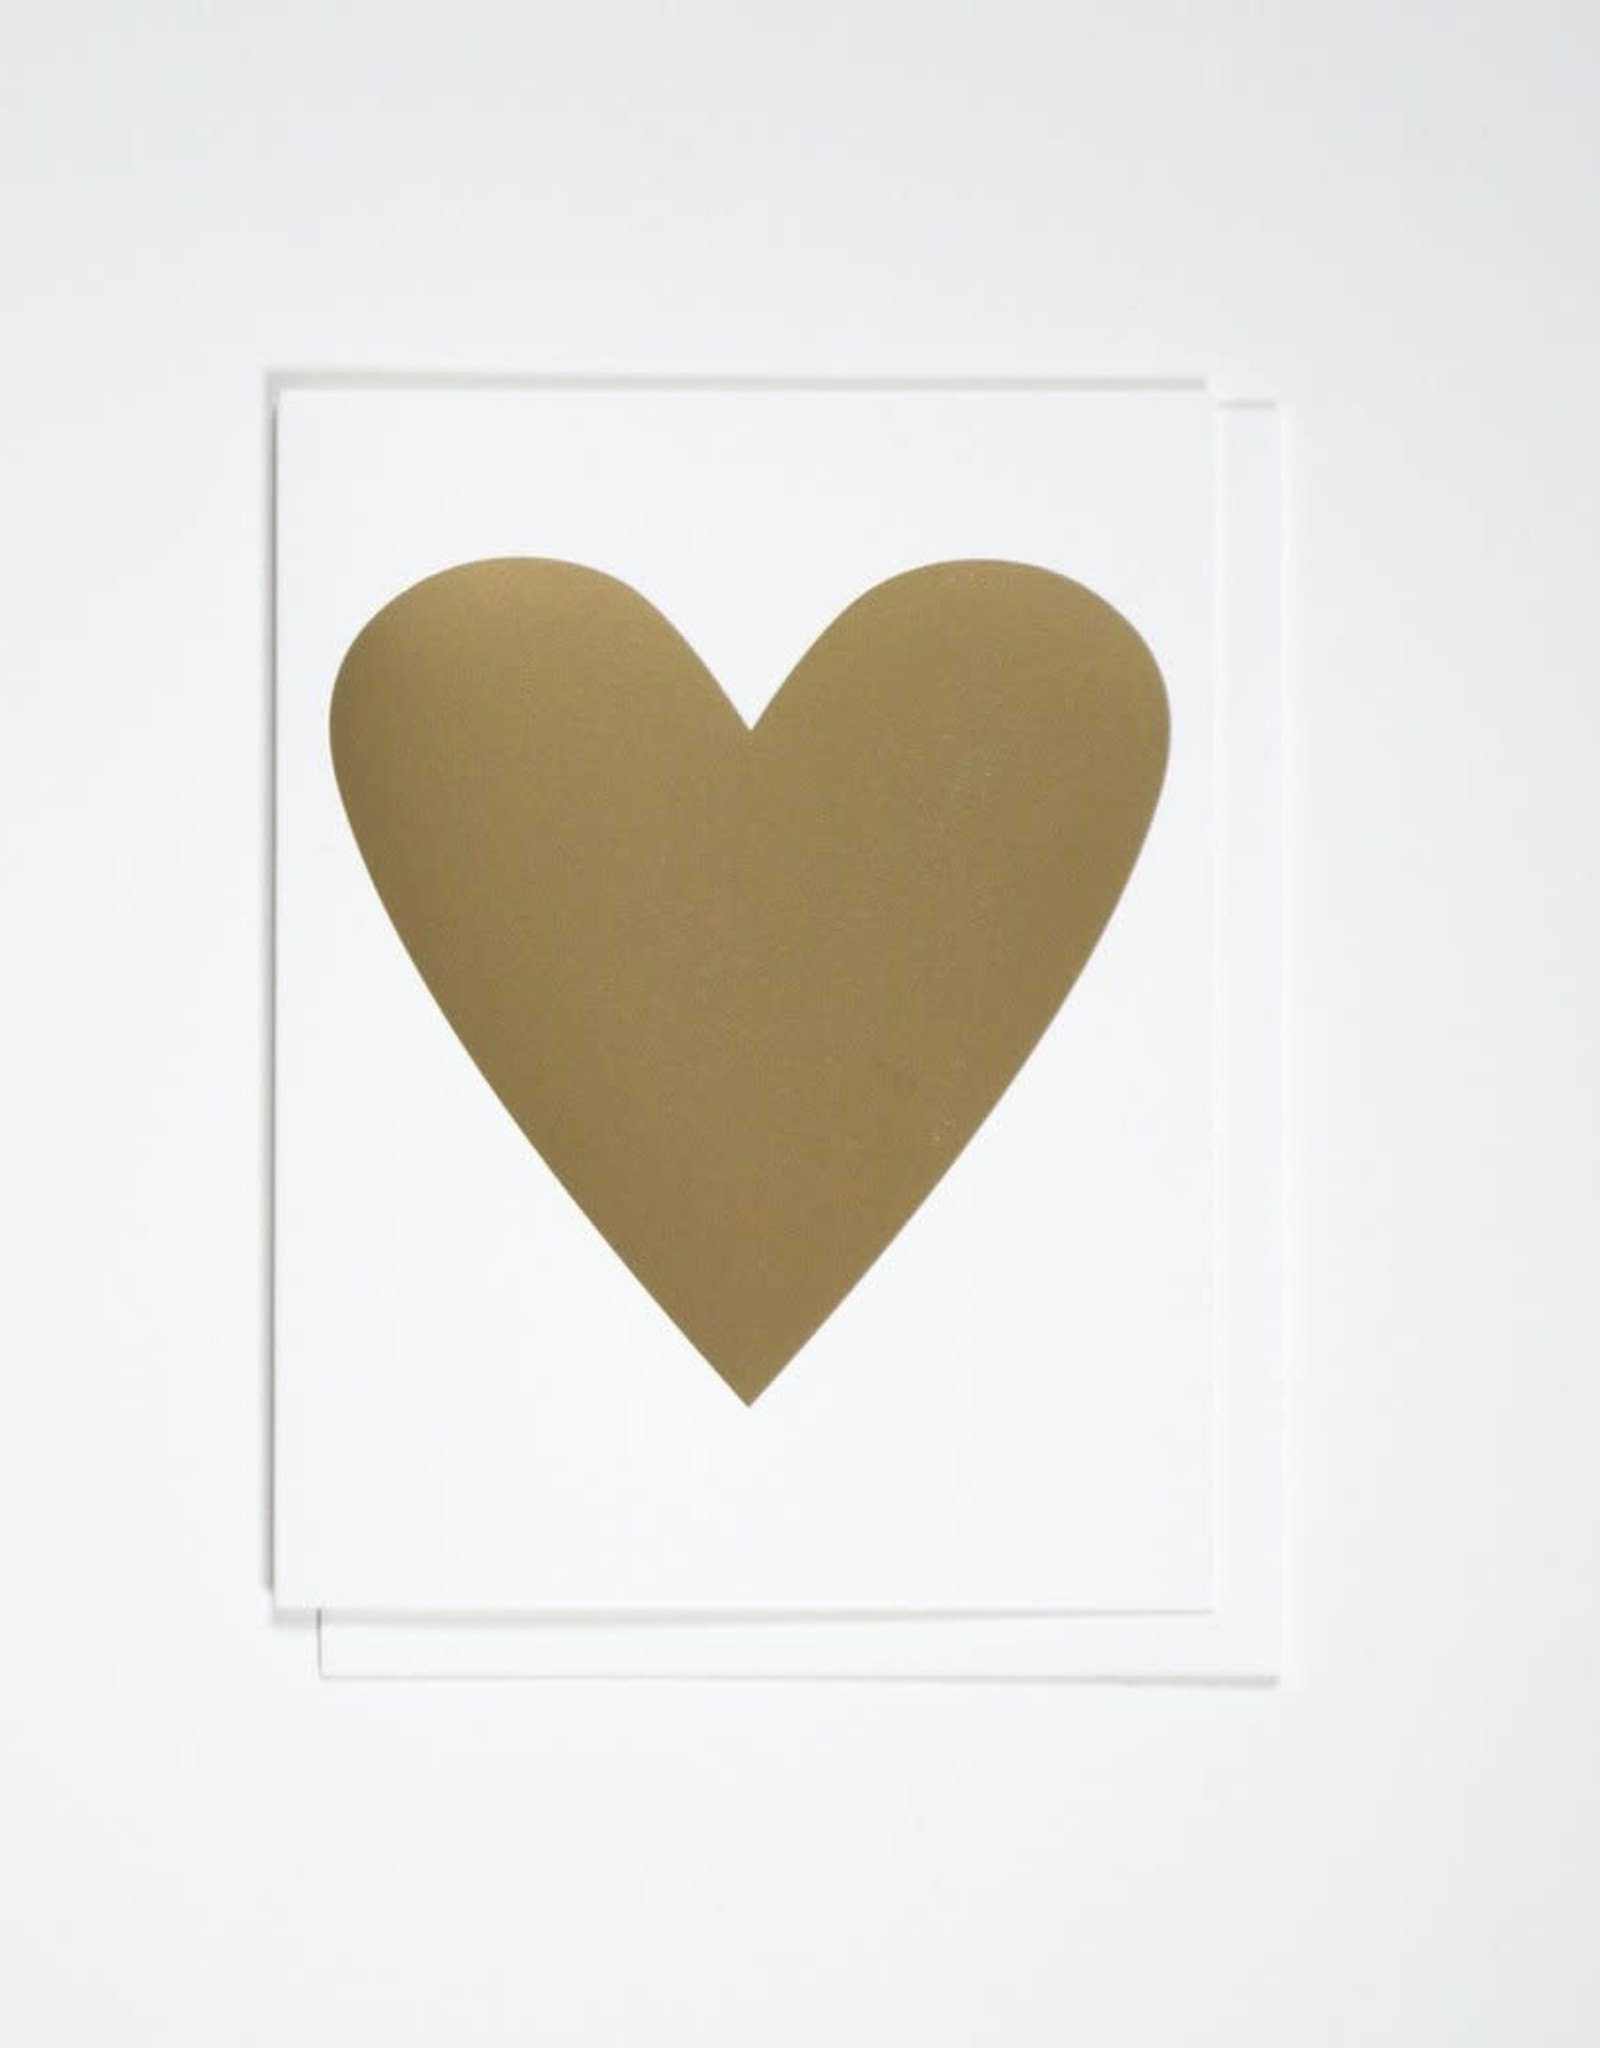 Banquet Atelier & Workshop 'Gold Foil Heart' Note Card